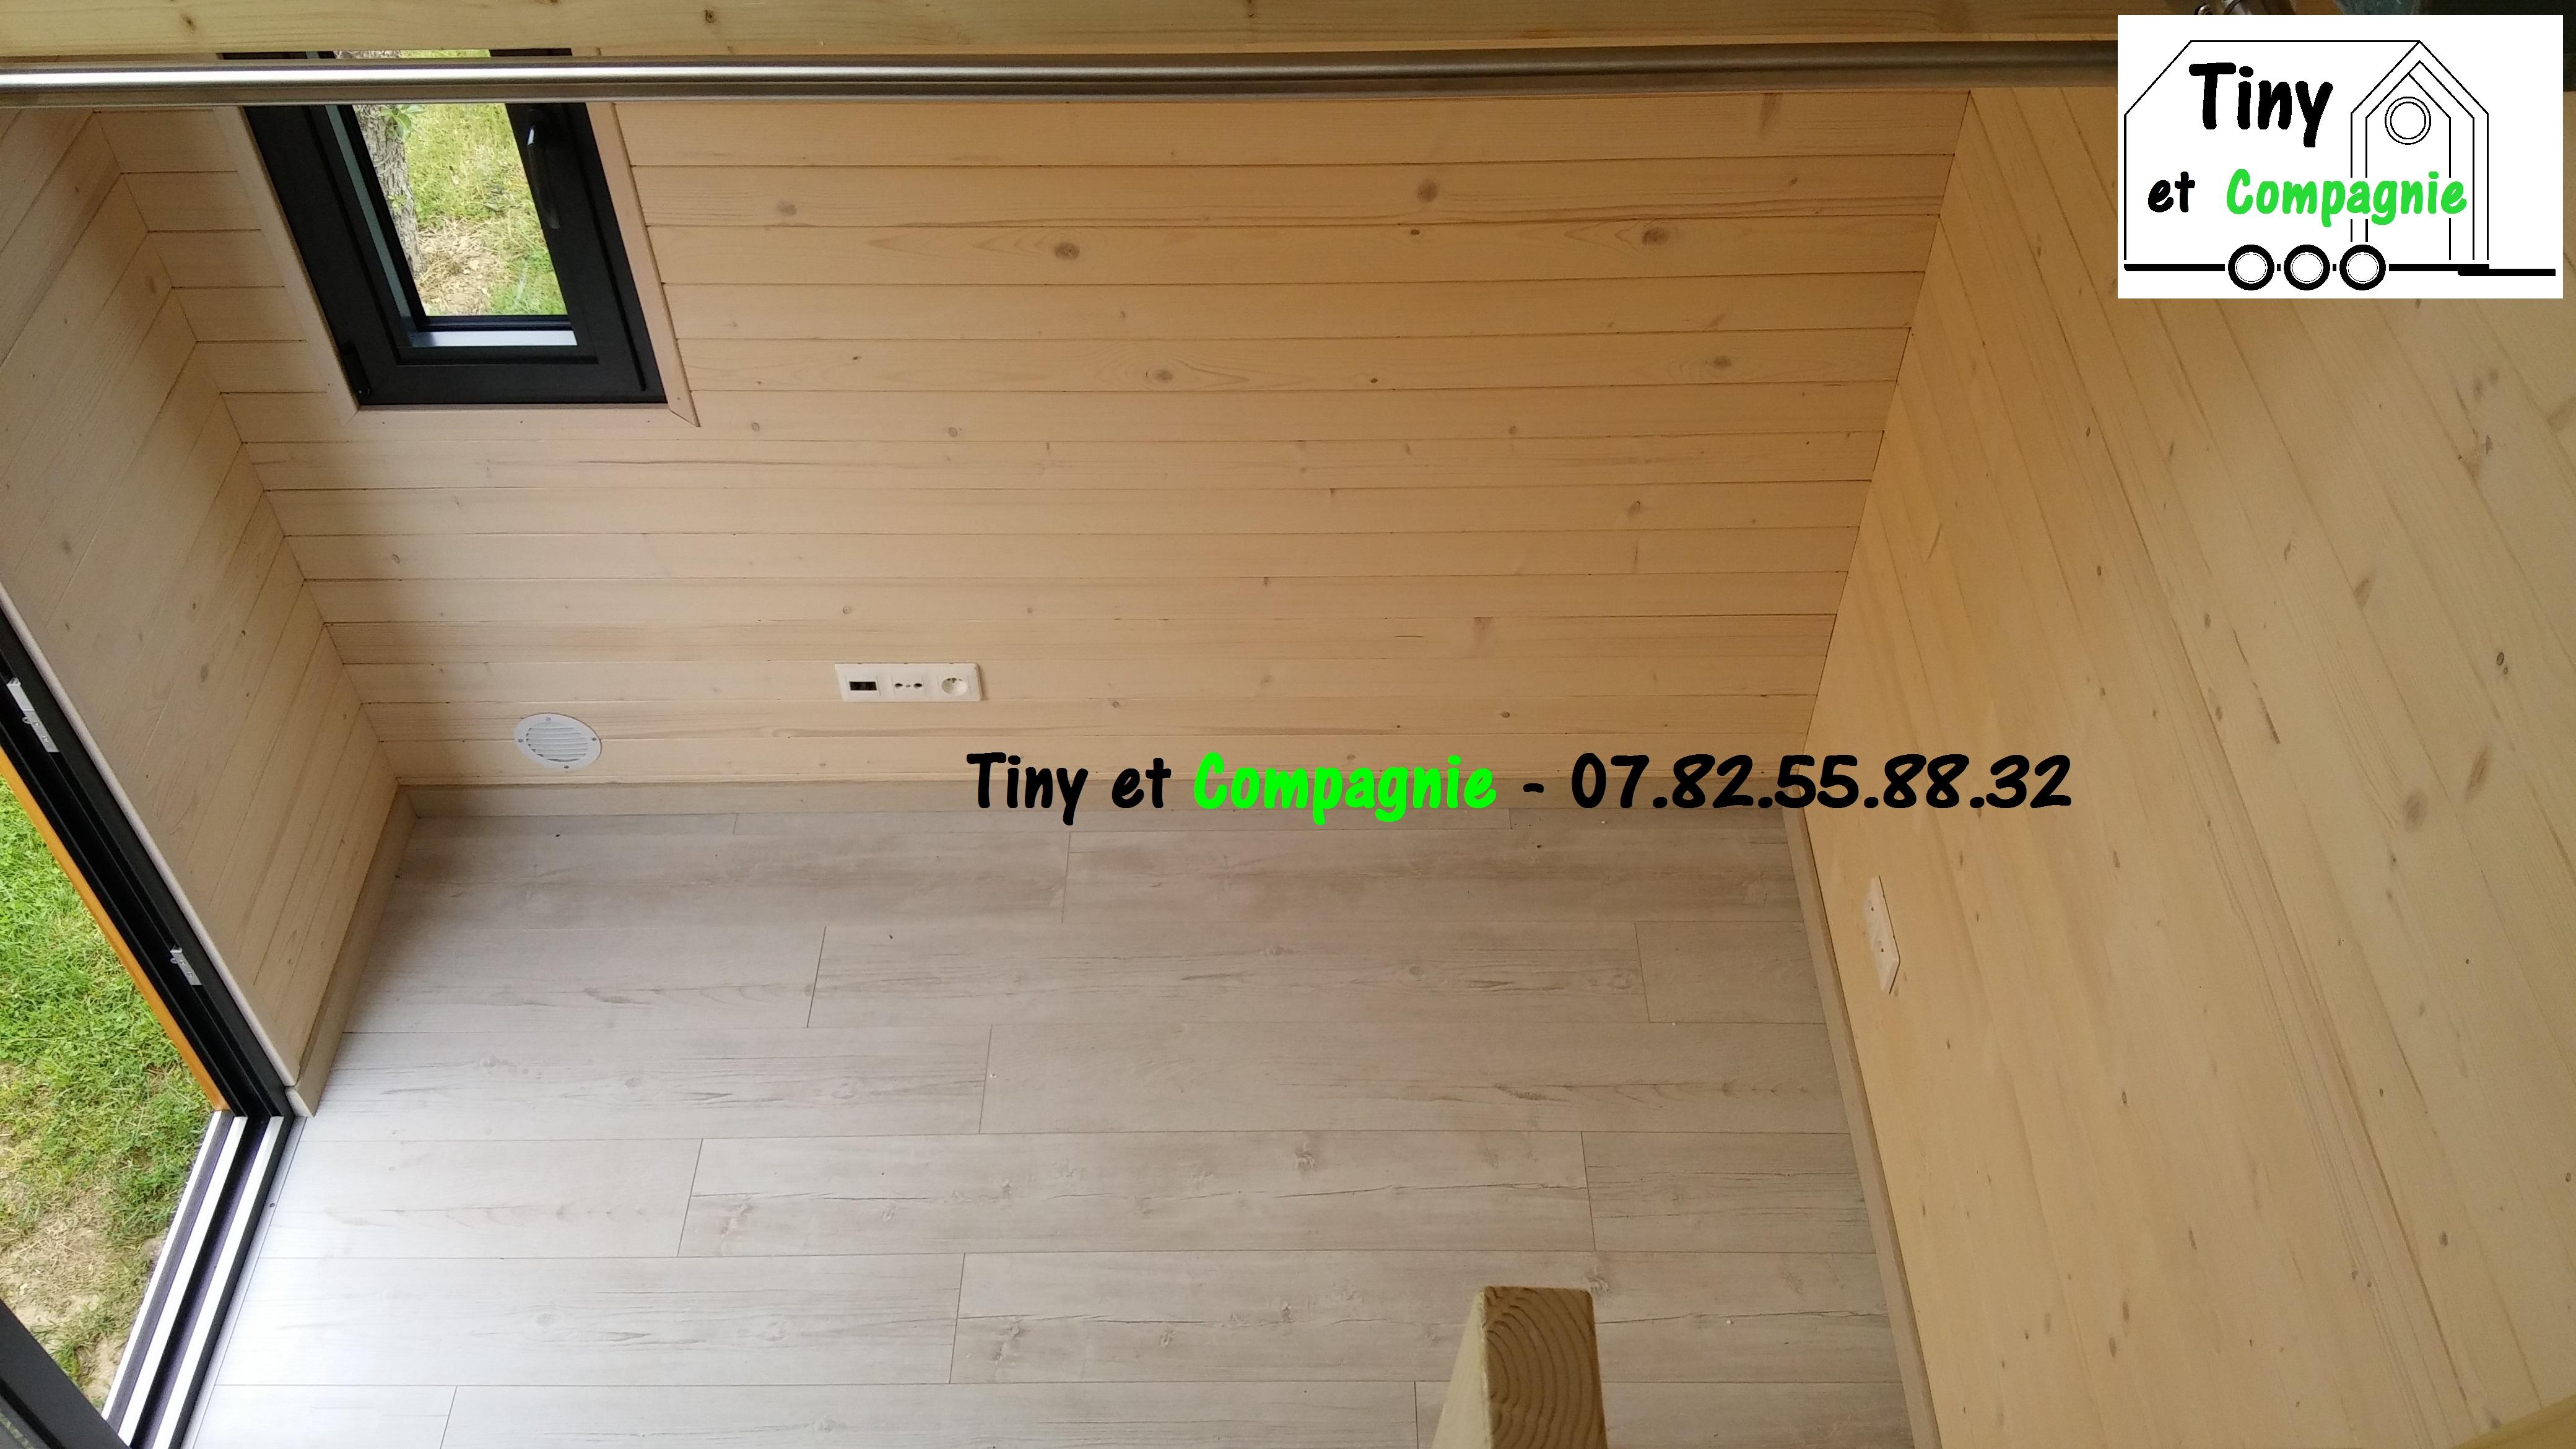 Tiny et Compagnie - Cabana 2019 (Salon).